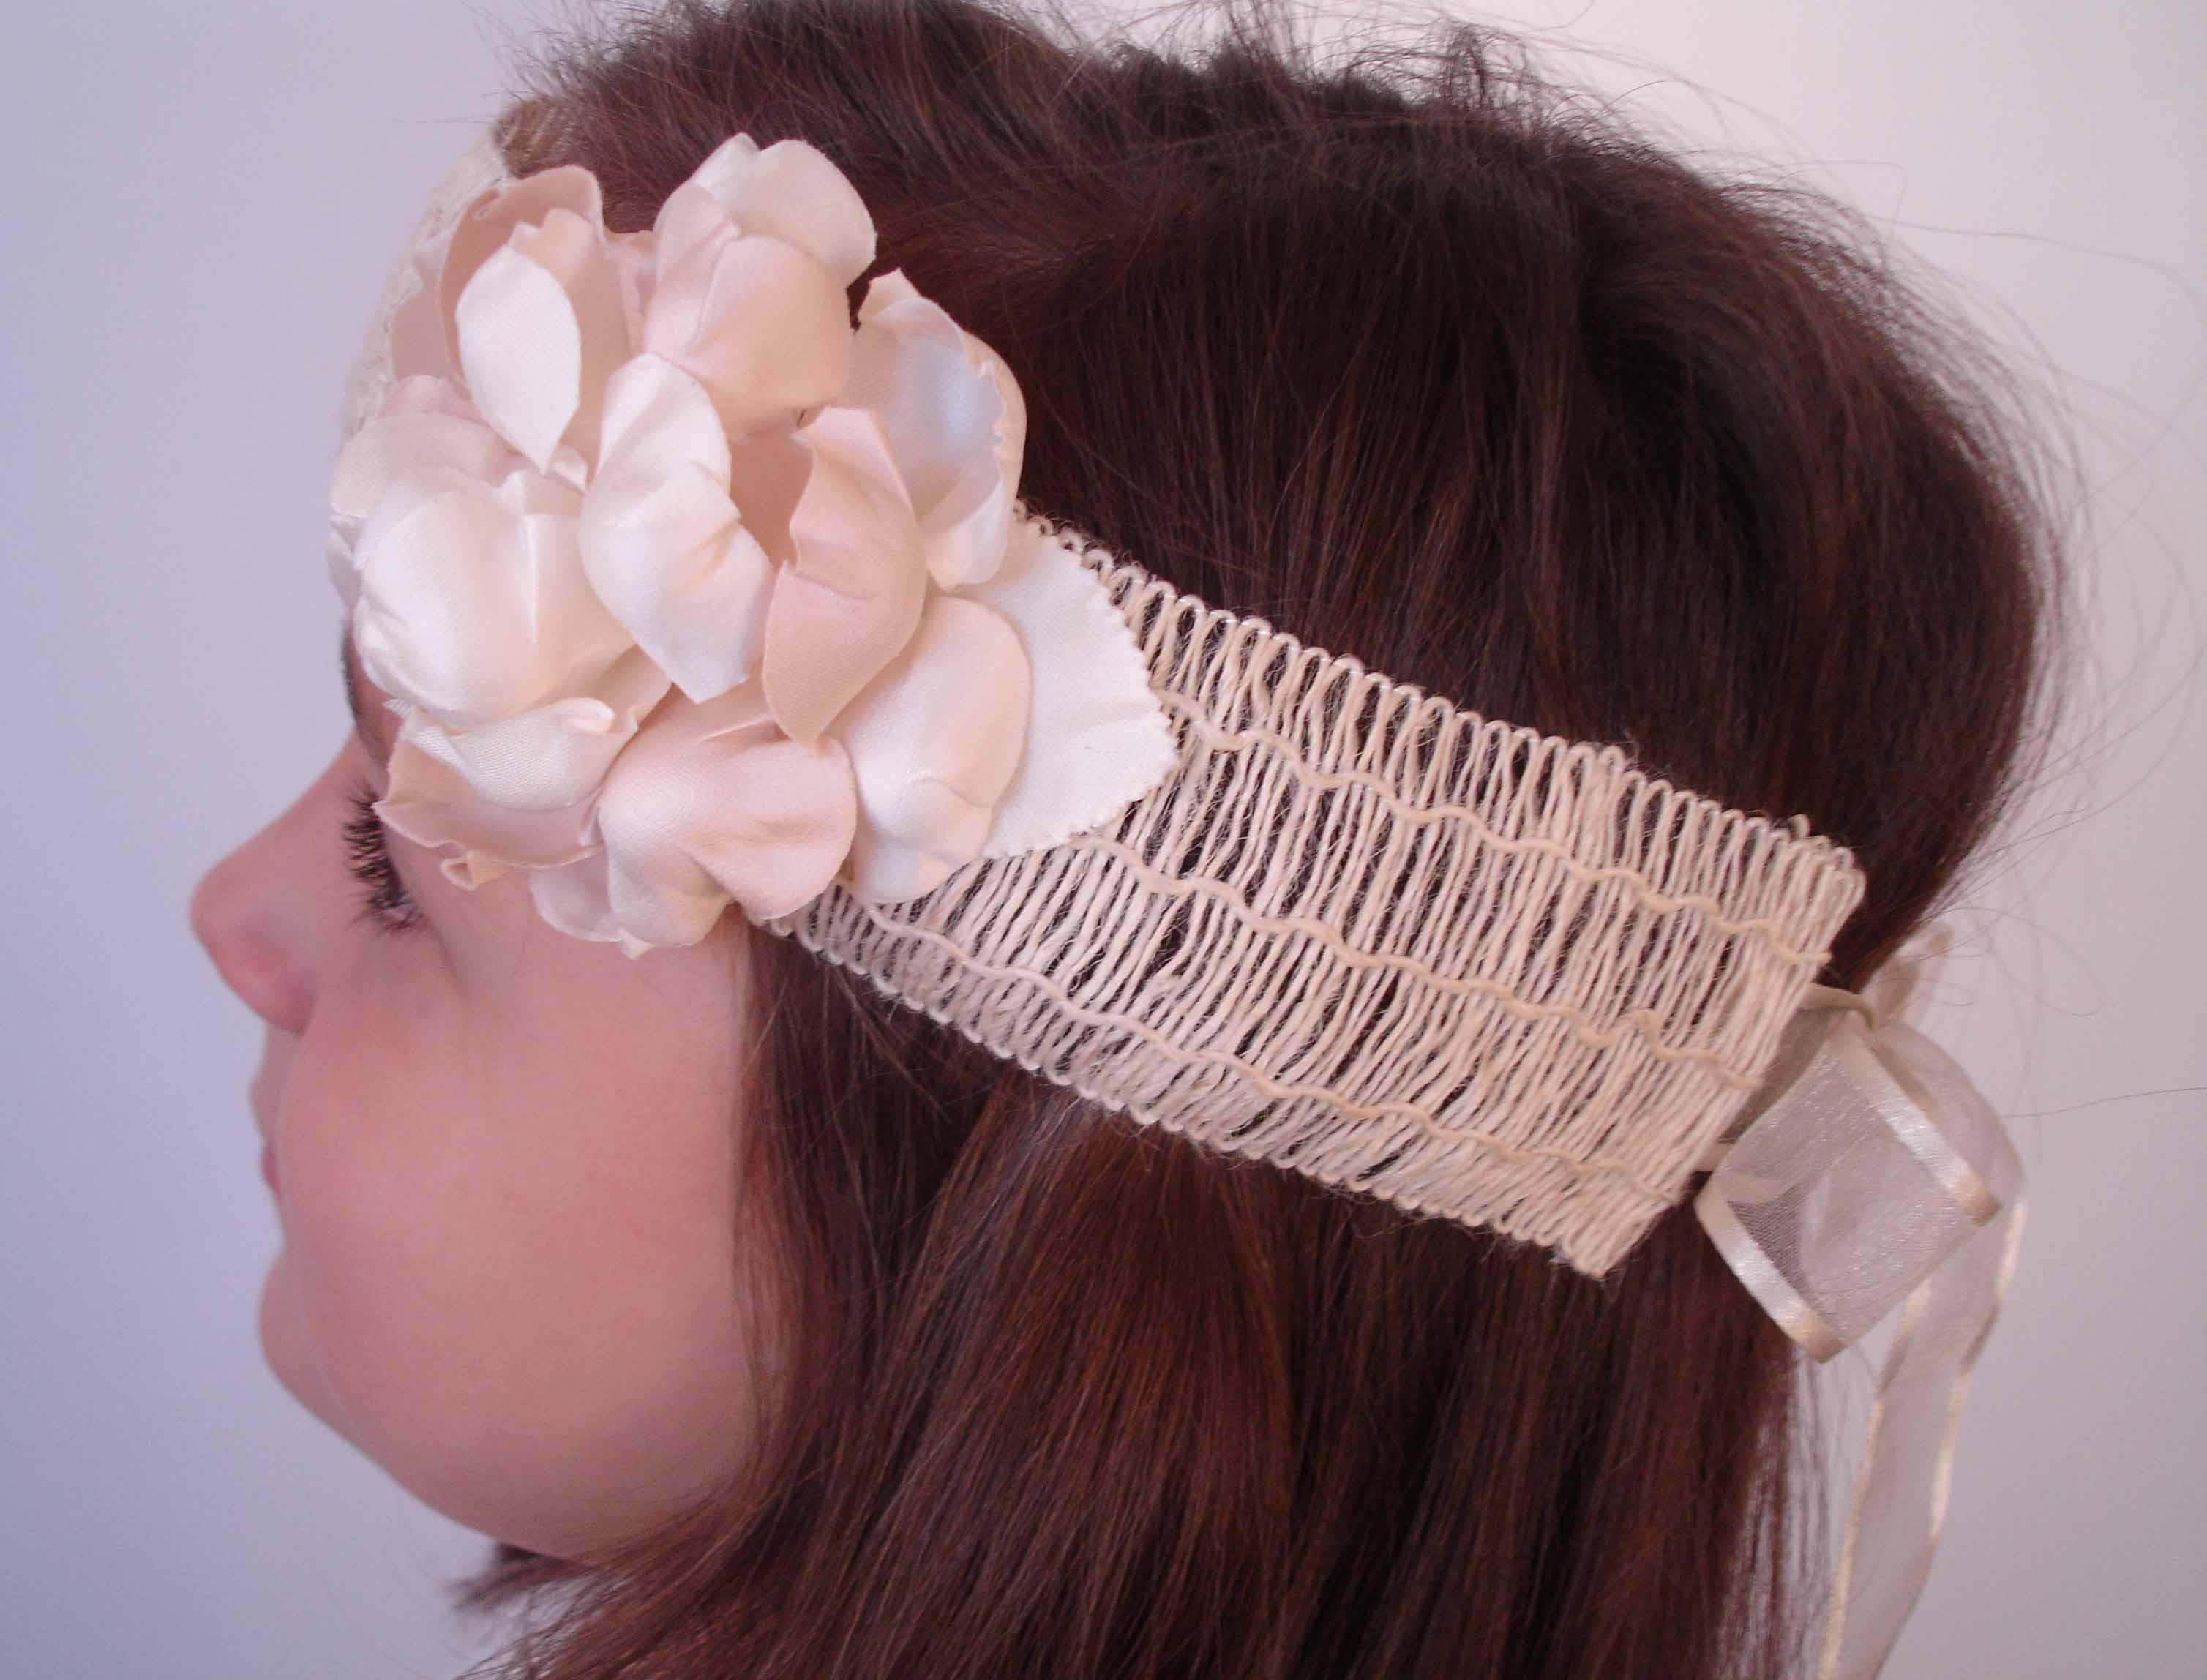 turbante rafia y flor valeria